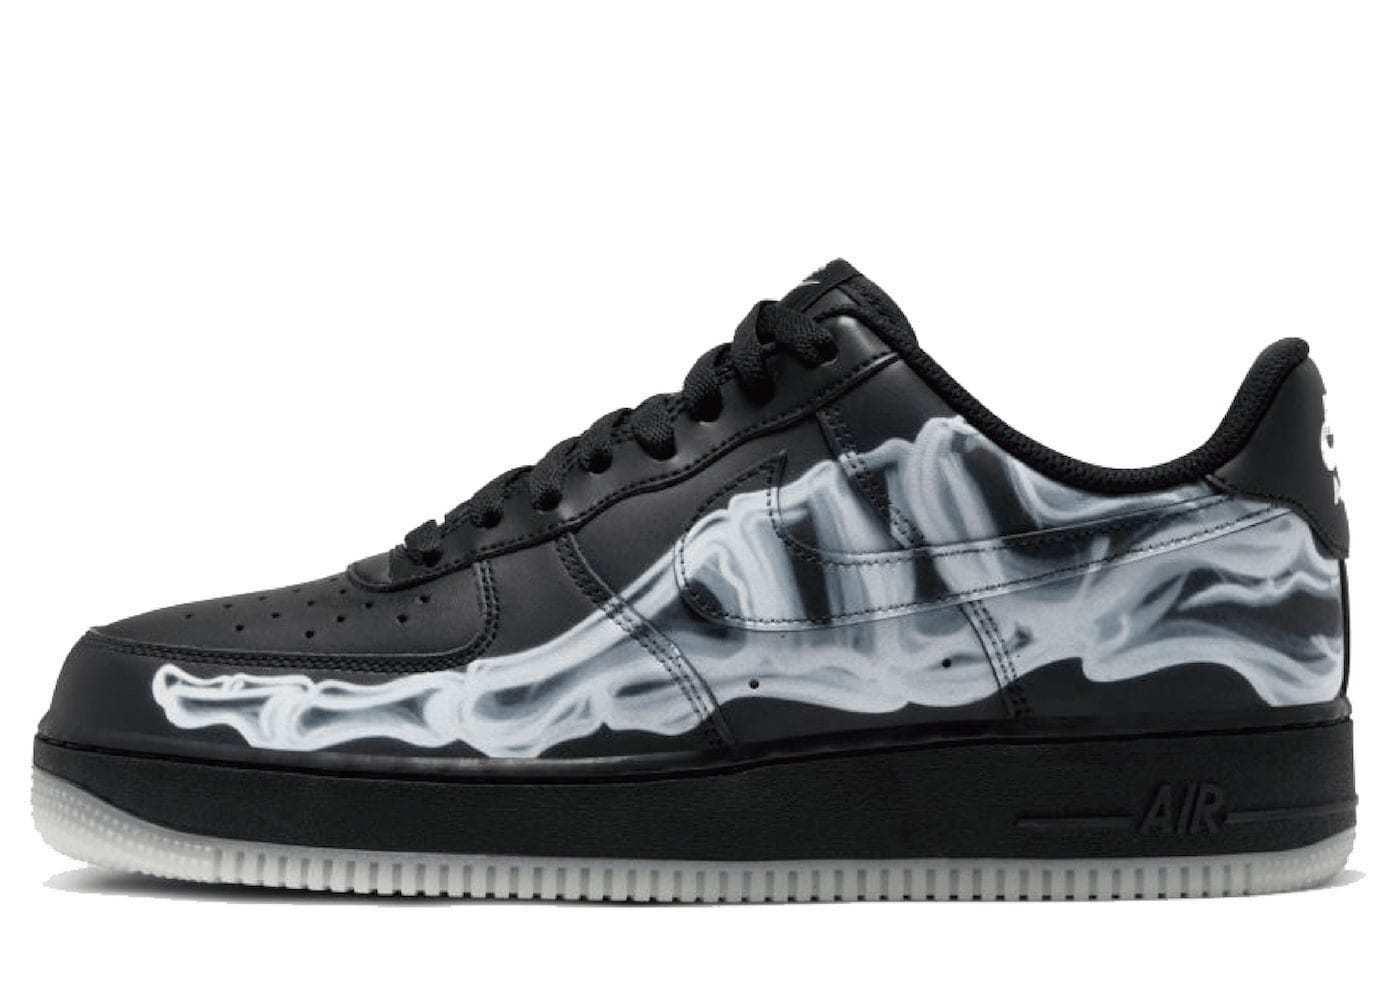 Nike Air Force 1 Skeleton Black On Blackの写真